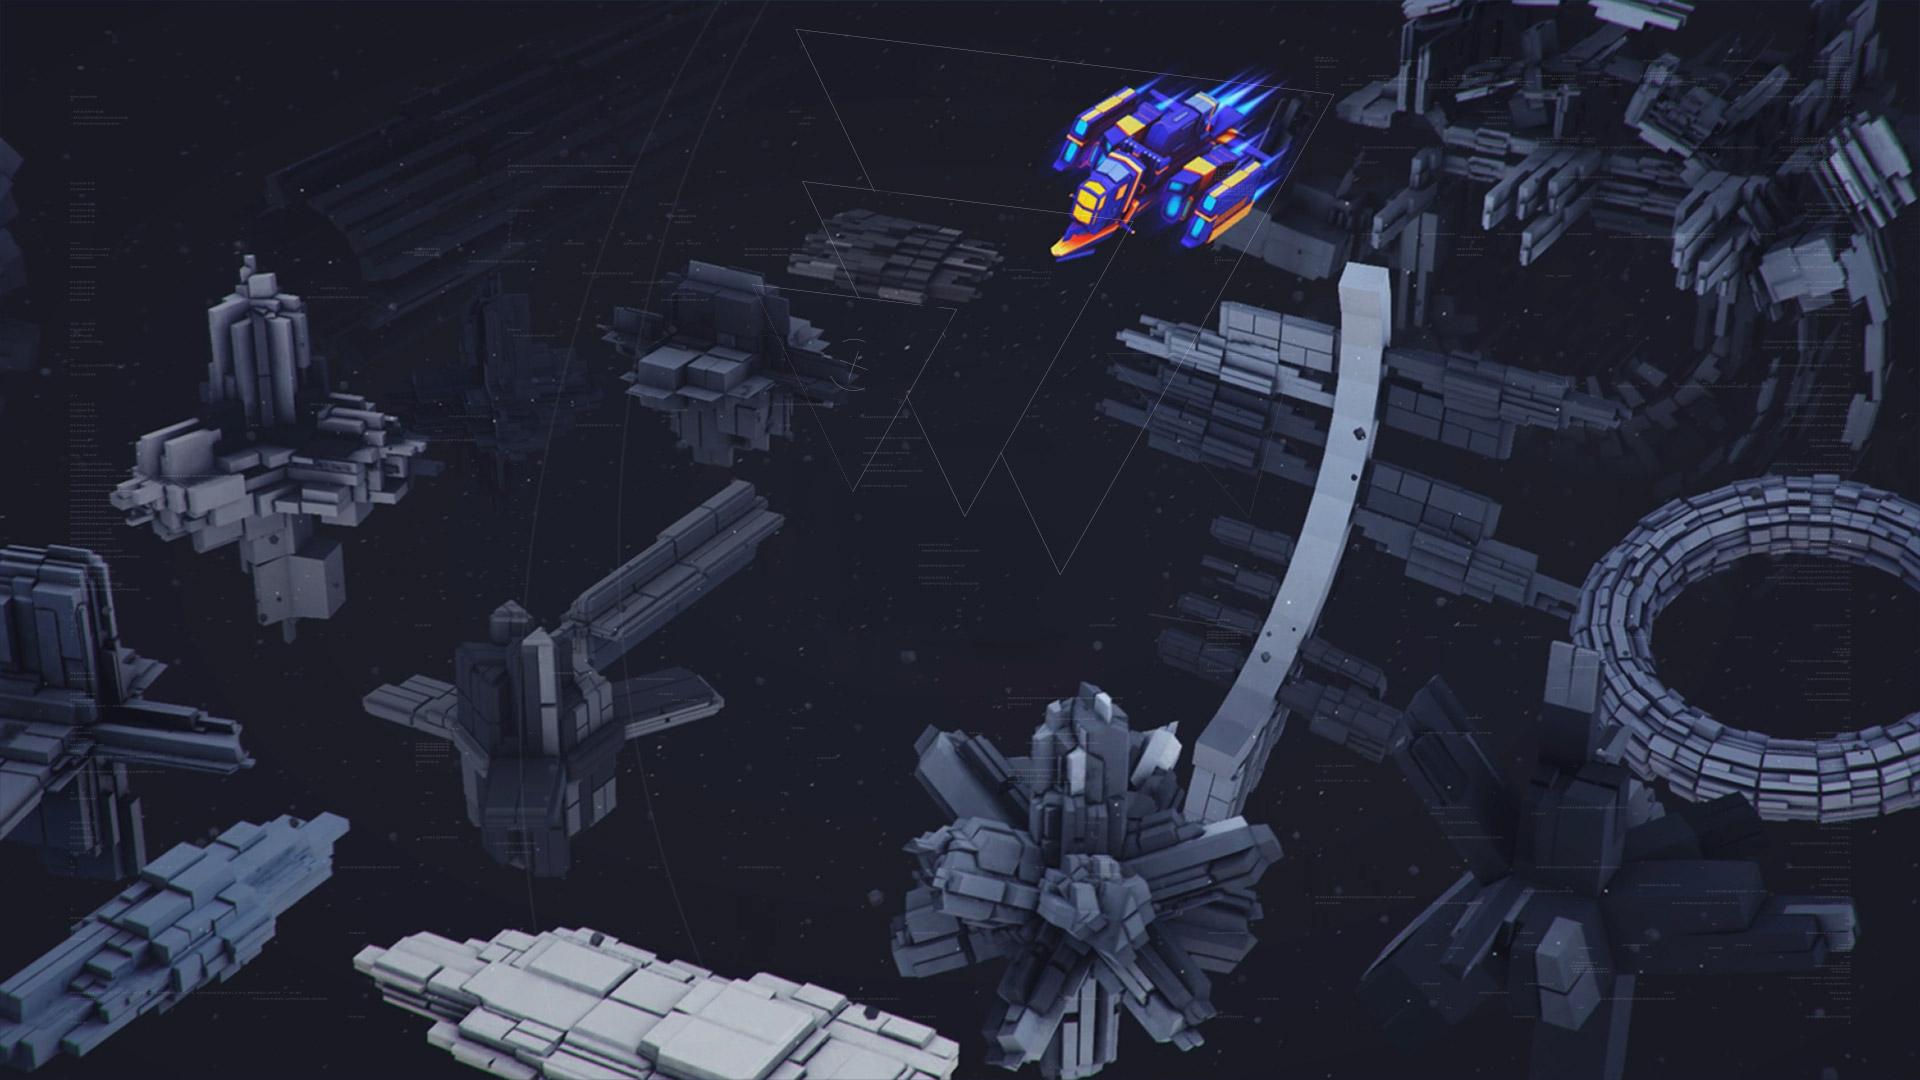 Space_Journey_Unity3D_AssetStore_Structure.jpg